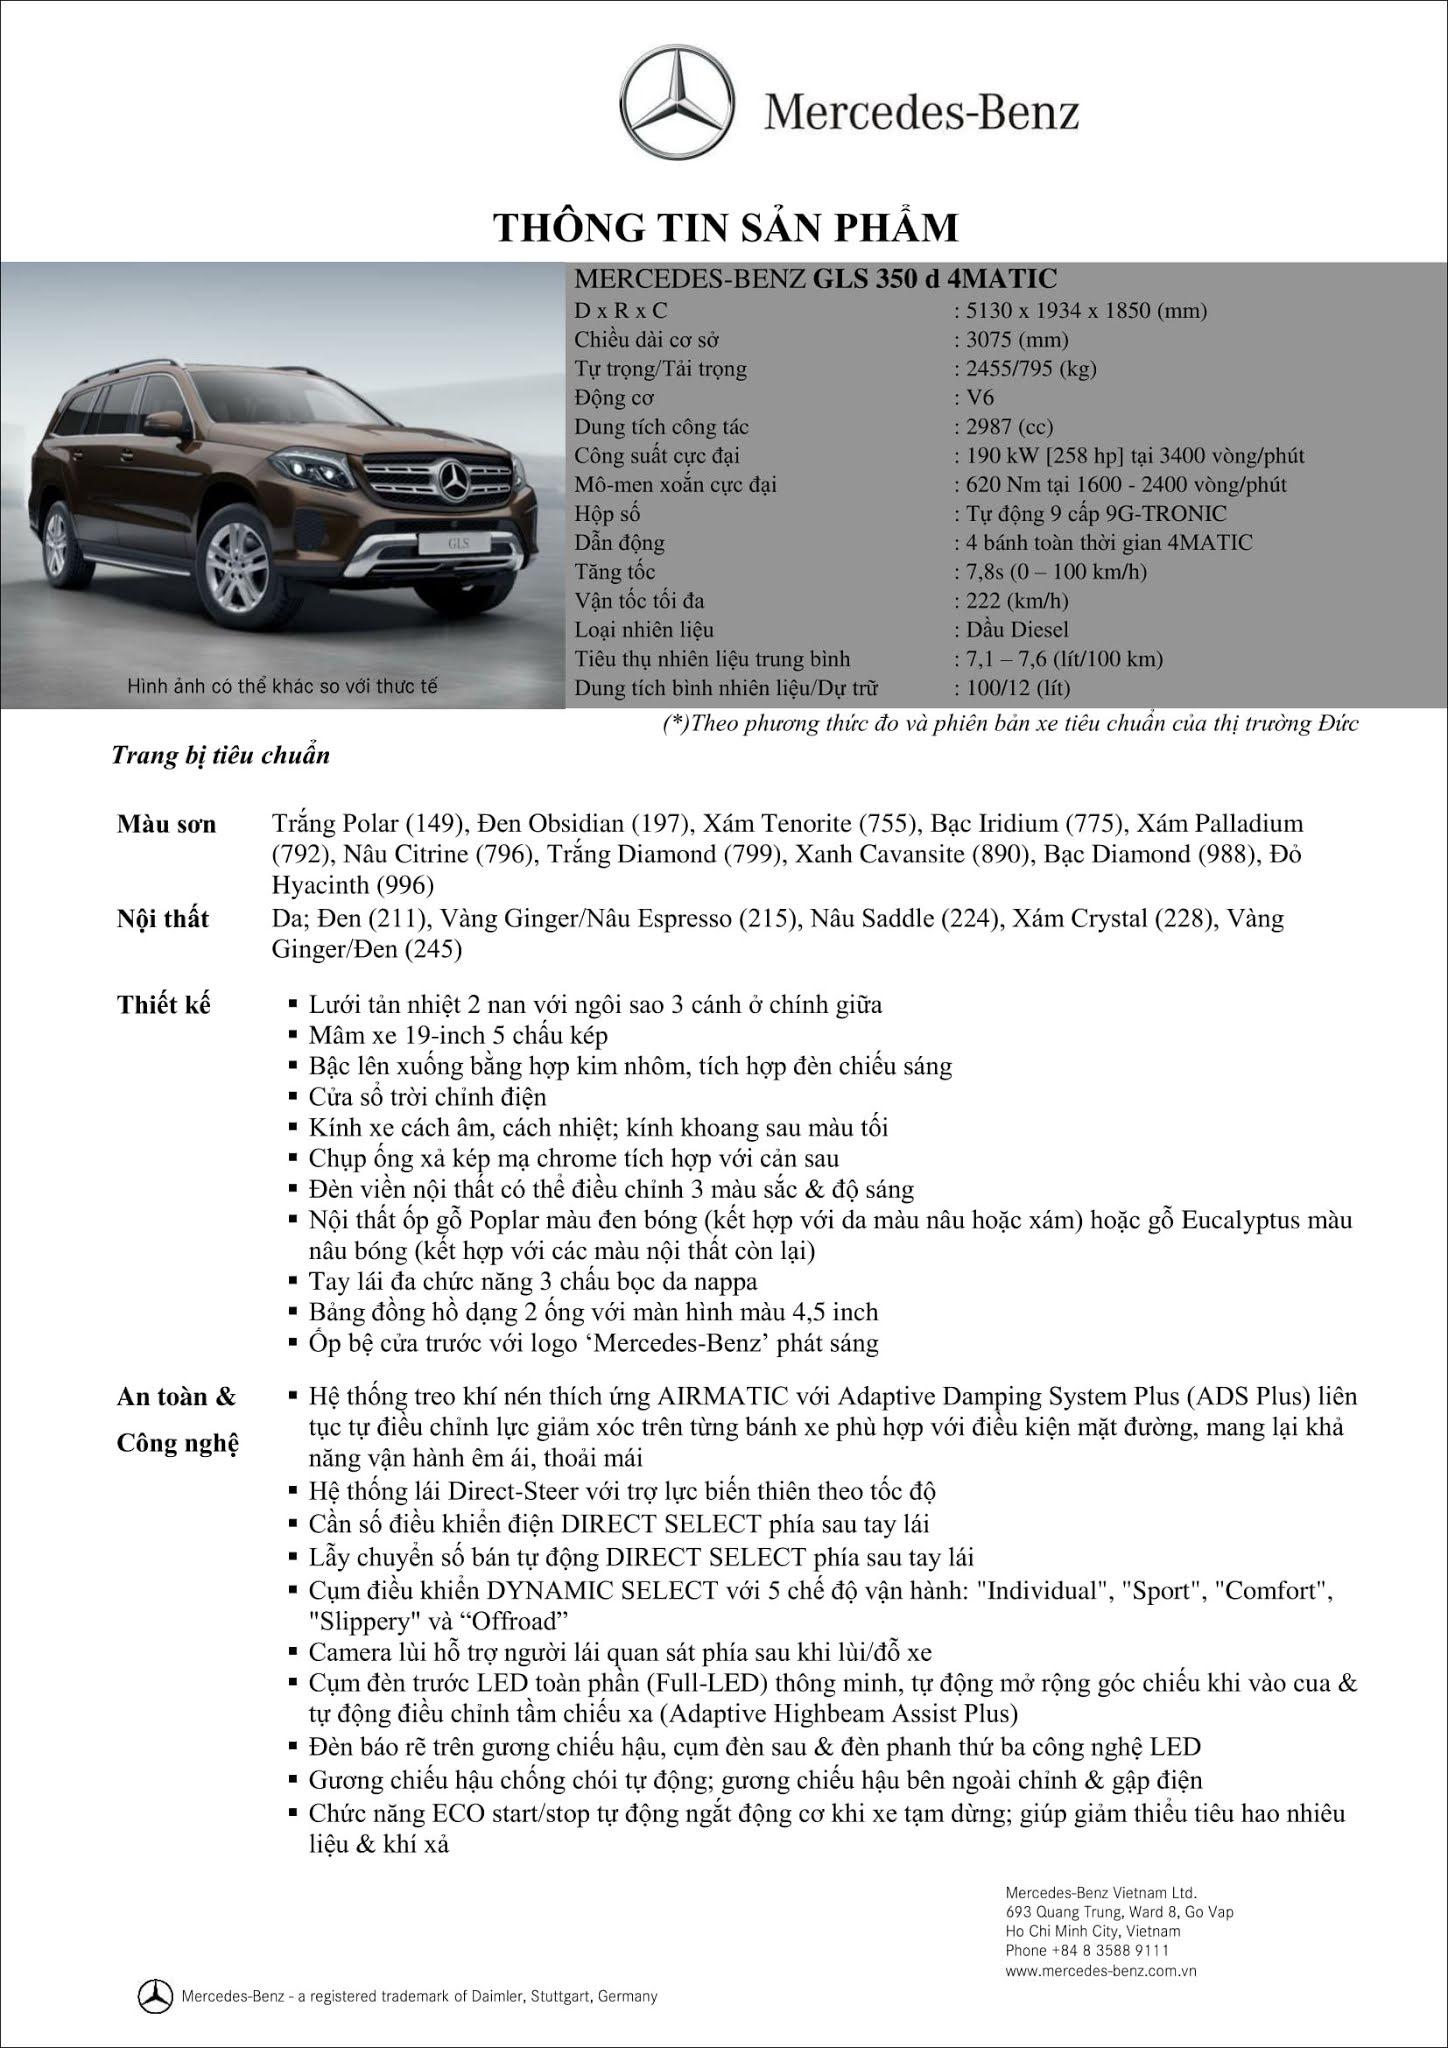 Bảng thông số kỹ thuật Mercedes GLS 350d 4MATIC 2019